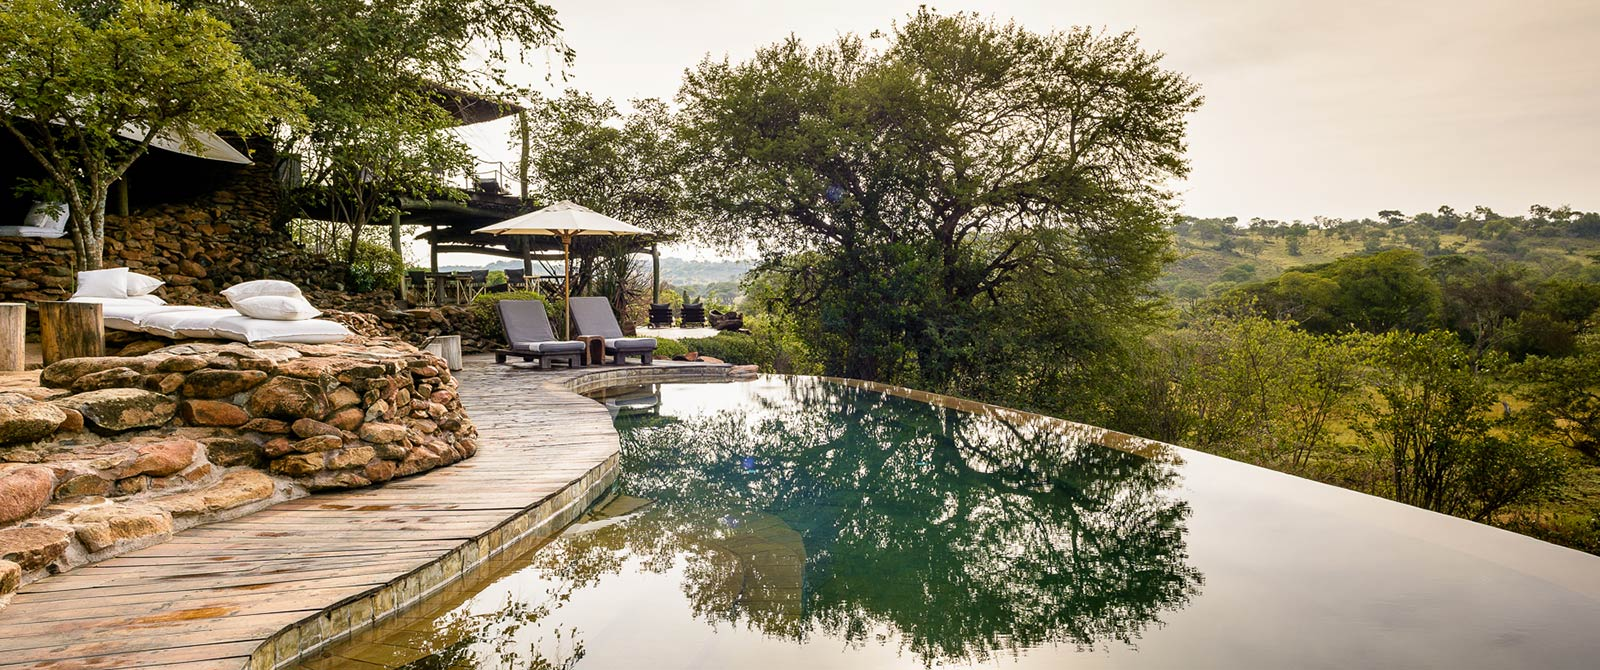 Singita Faru Faru Lodge Pool - Serengeti Great Migration Safari - Tanzania Highlights: Tarangire, Ngorongoro, and Serengeti Safari